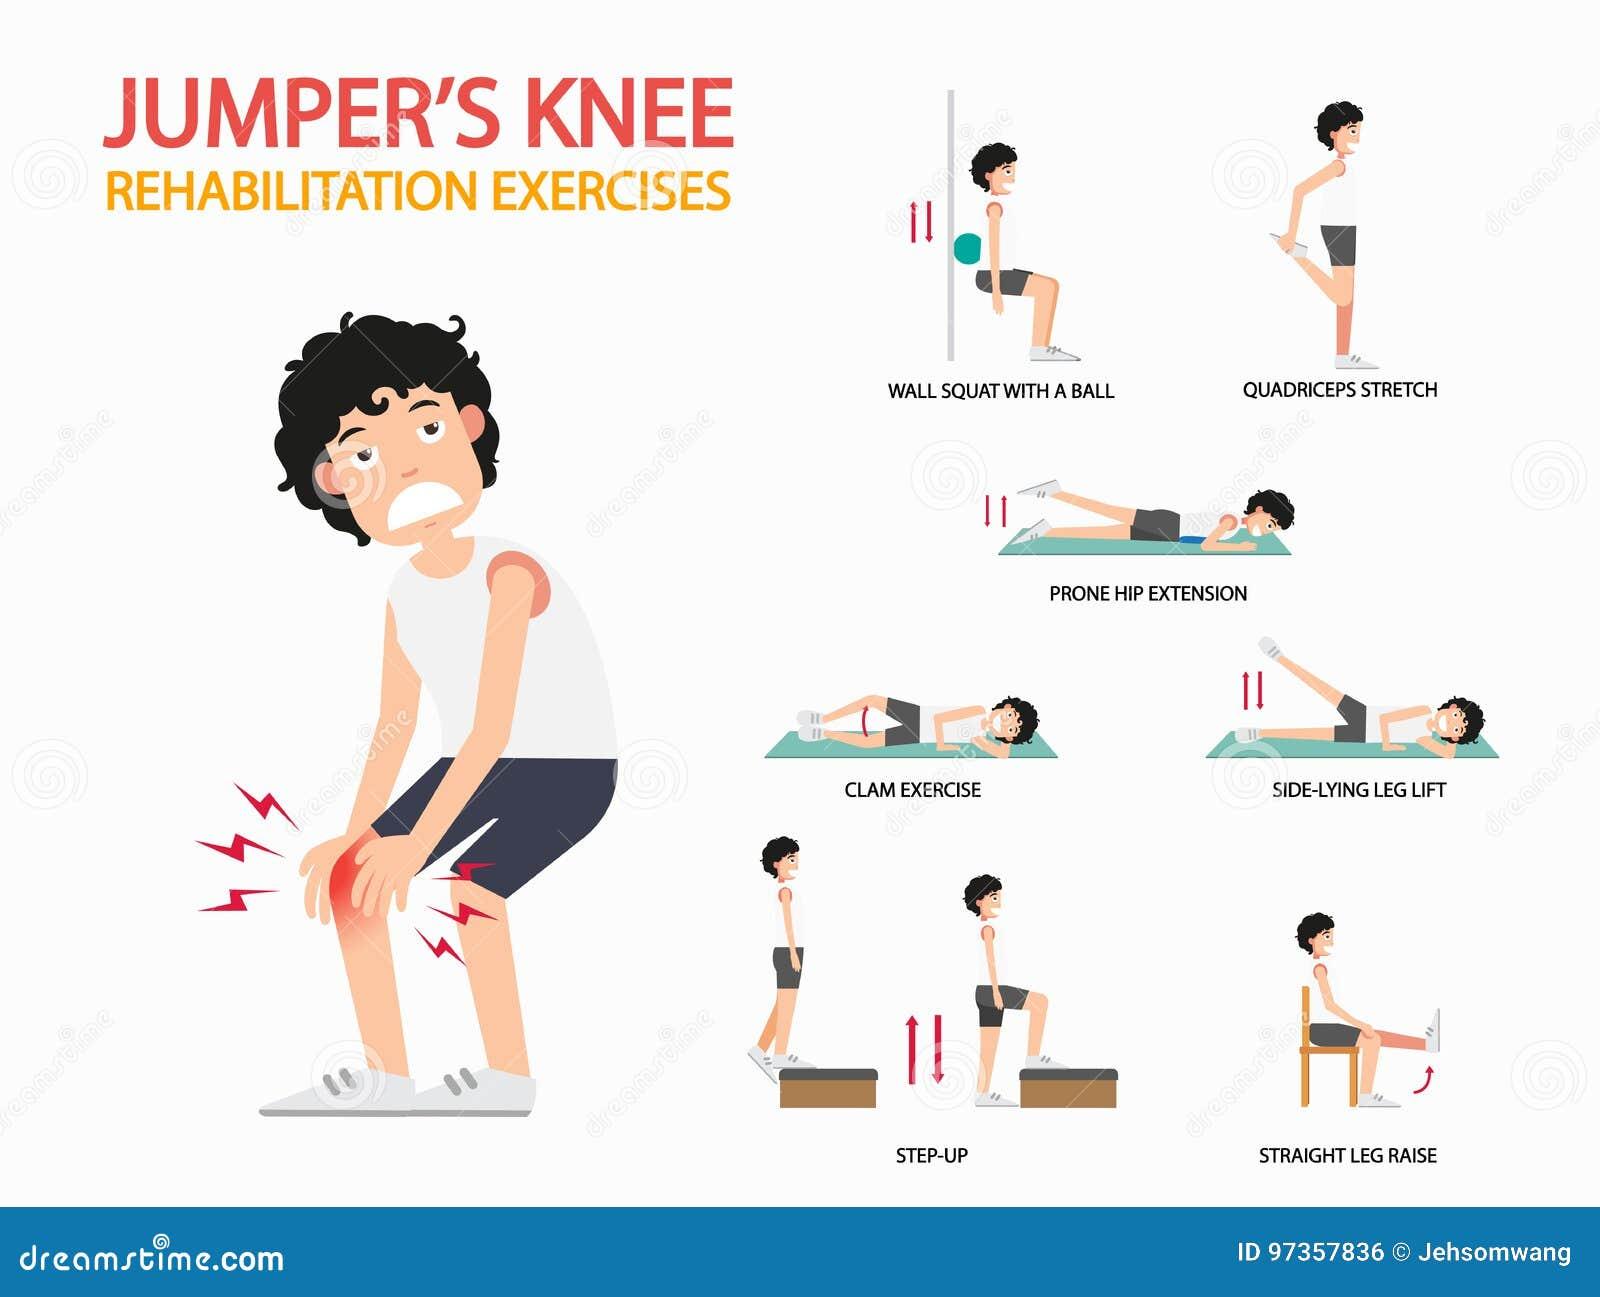 Jumper`s knee rehabilitation exercises infographic